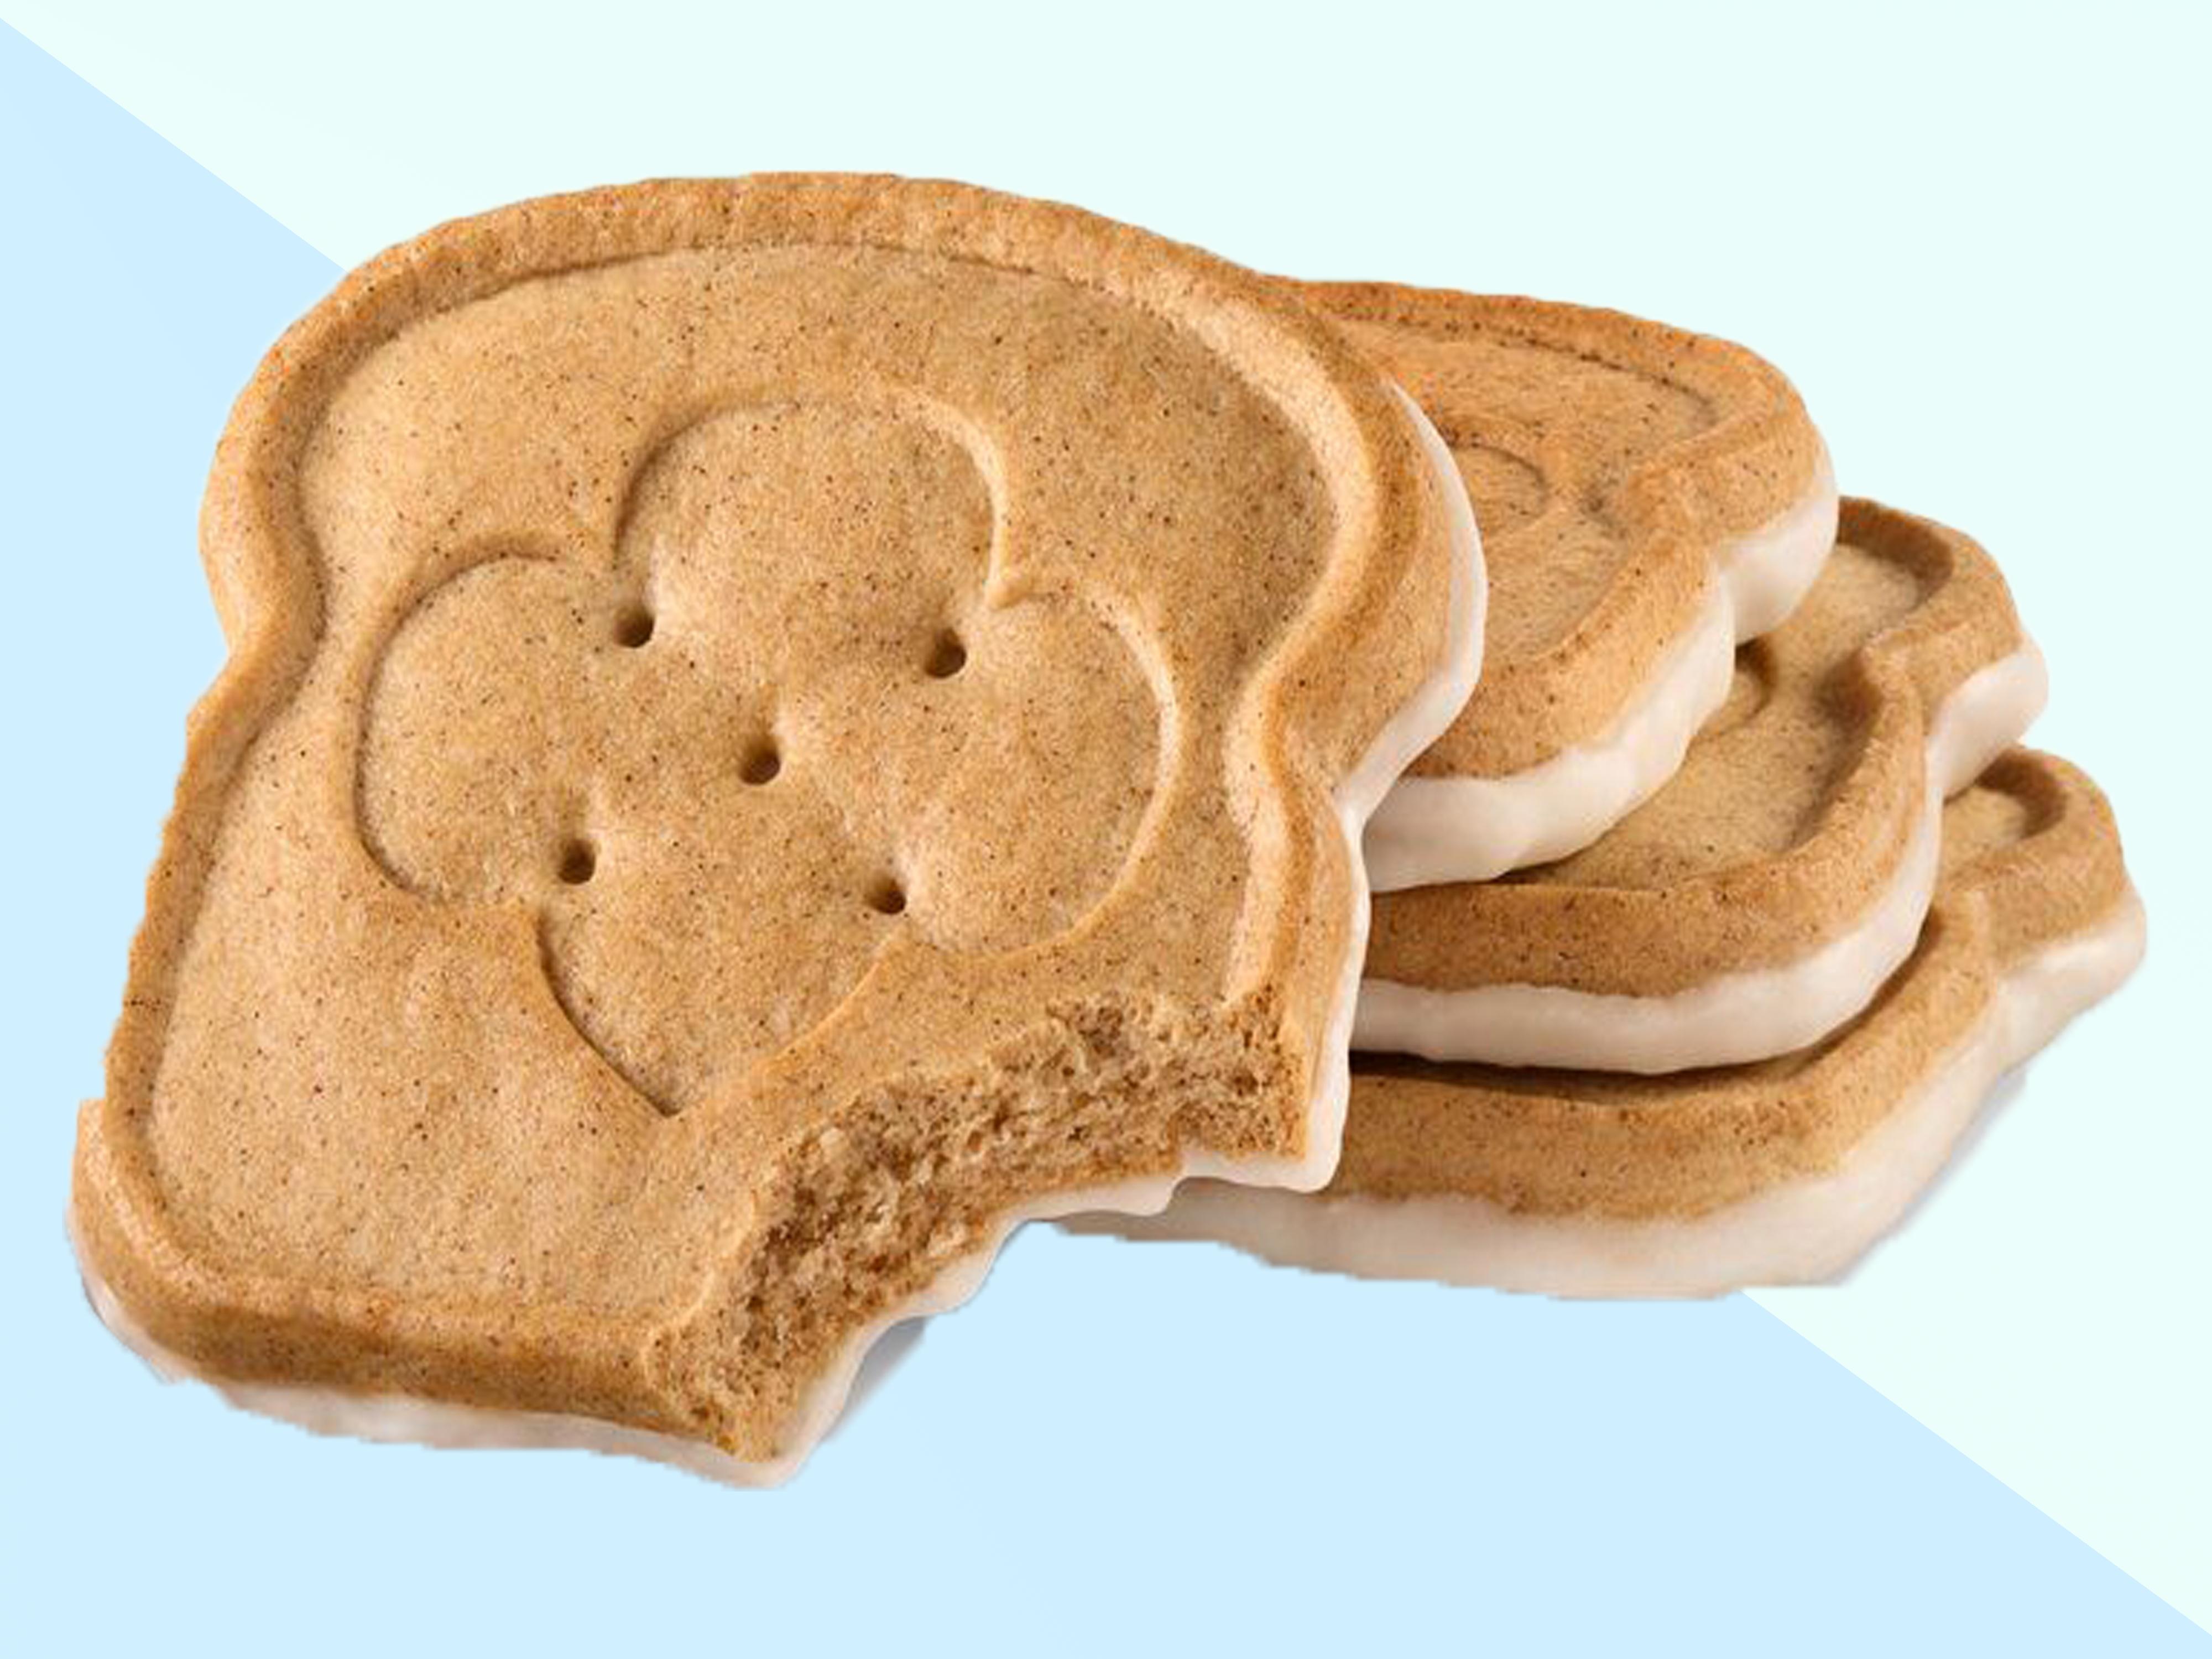 toast-yay-cookie